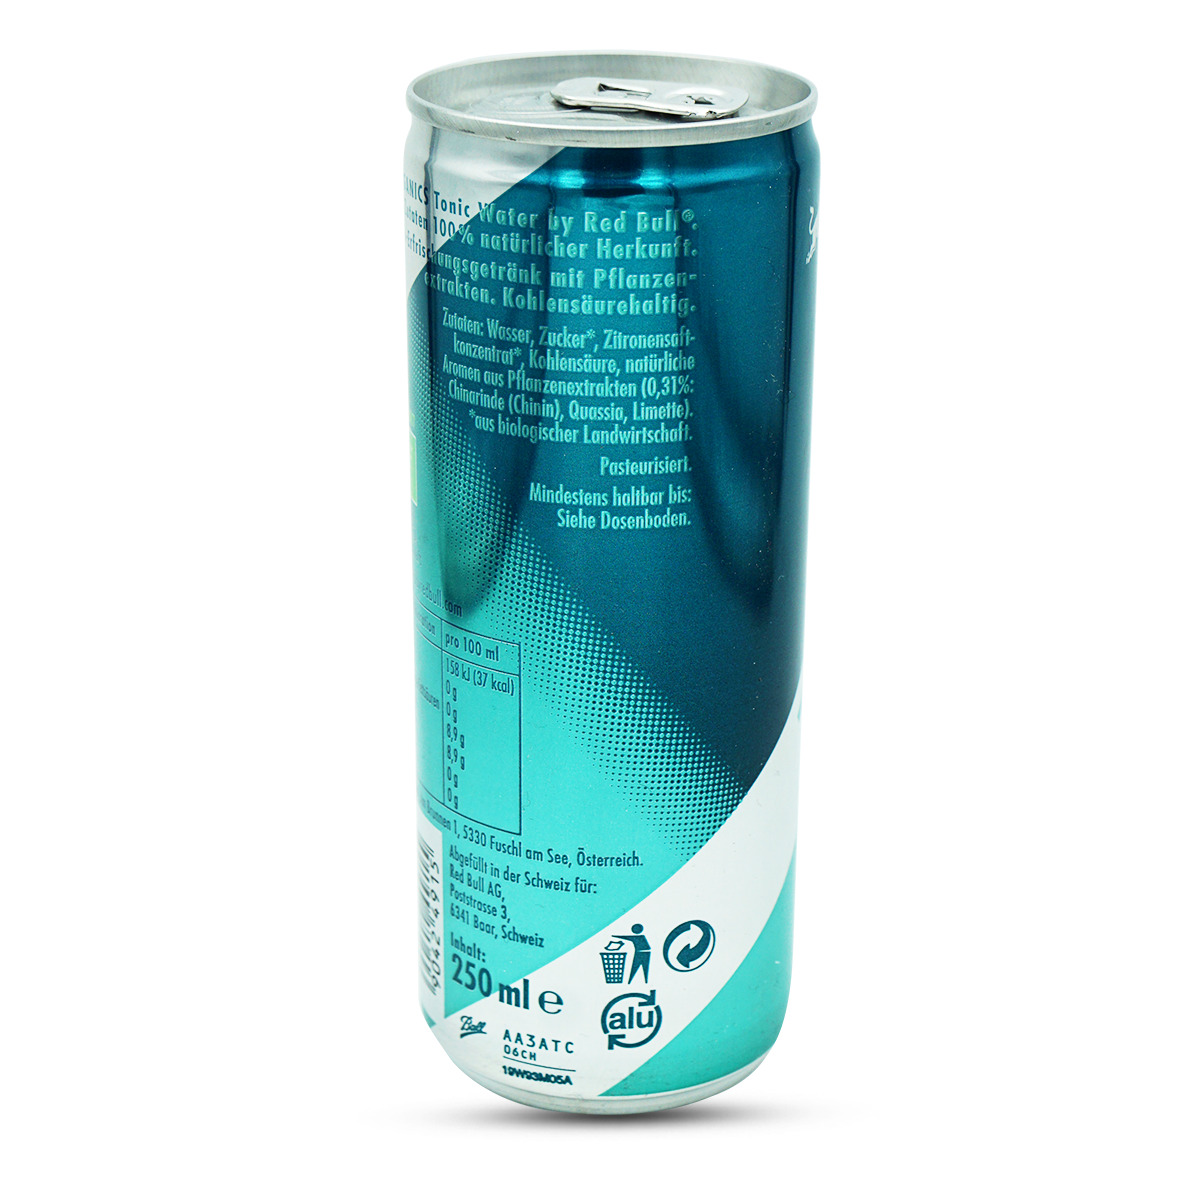 Organics by Red Bull Tonic Water